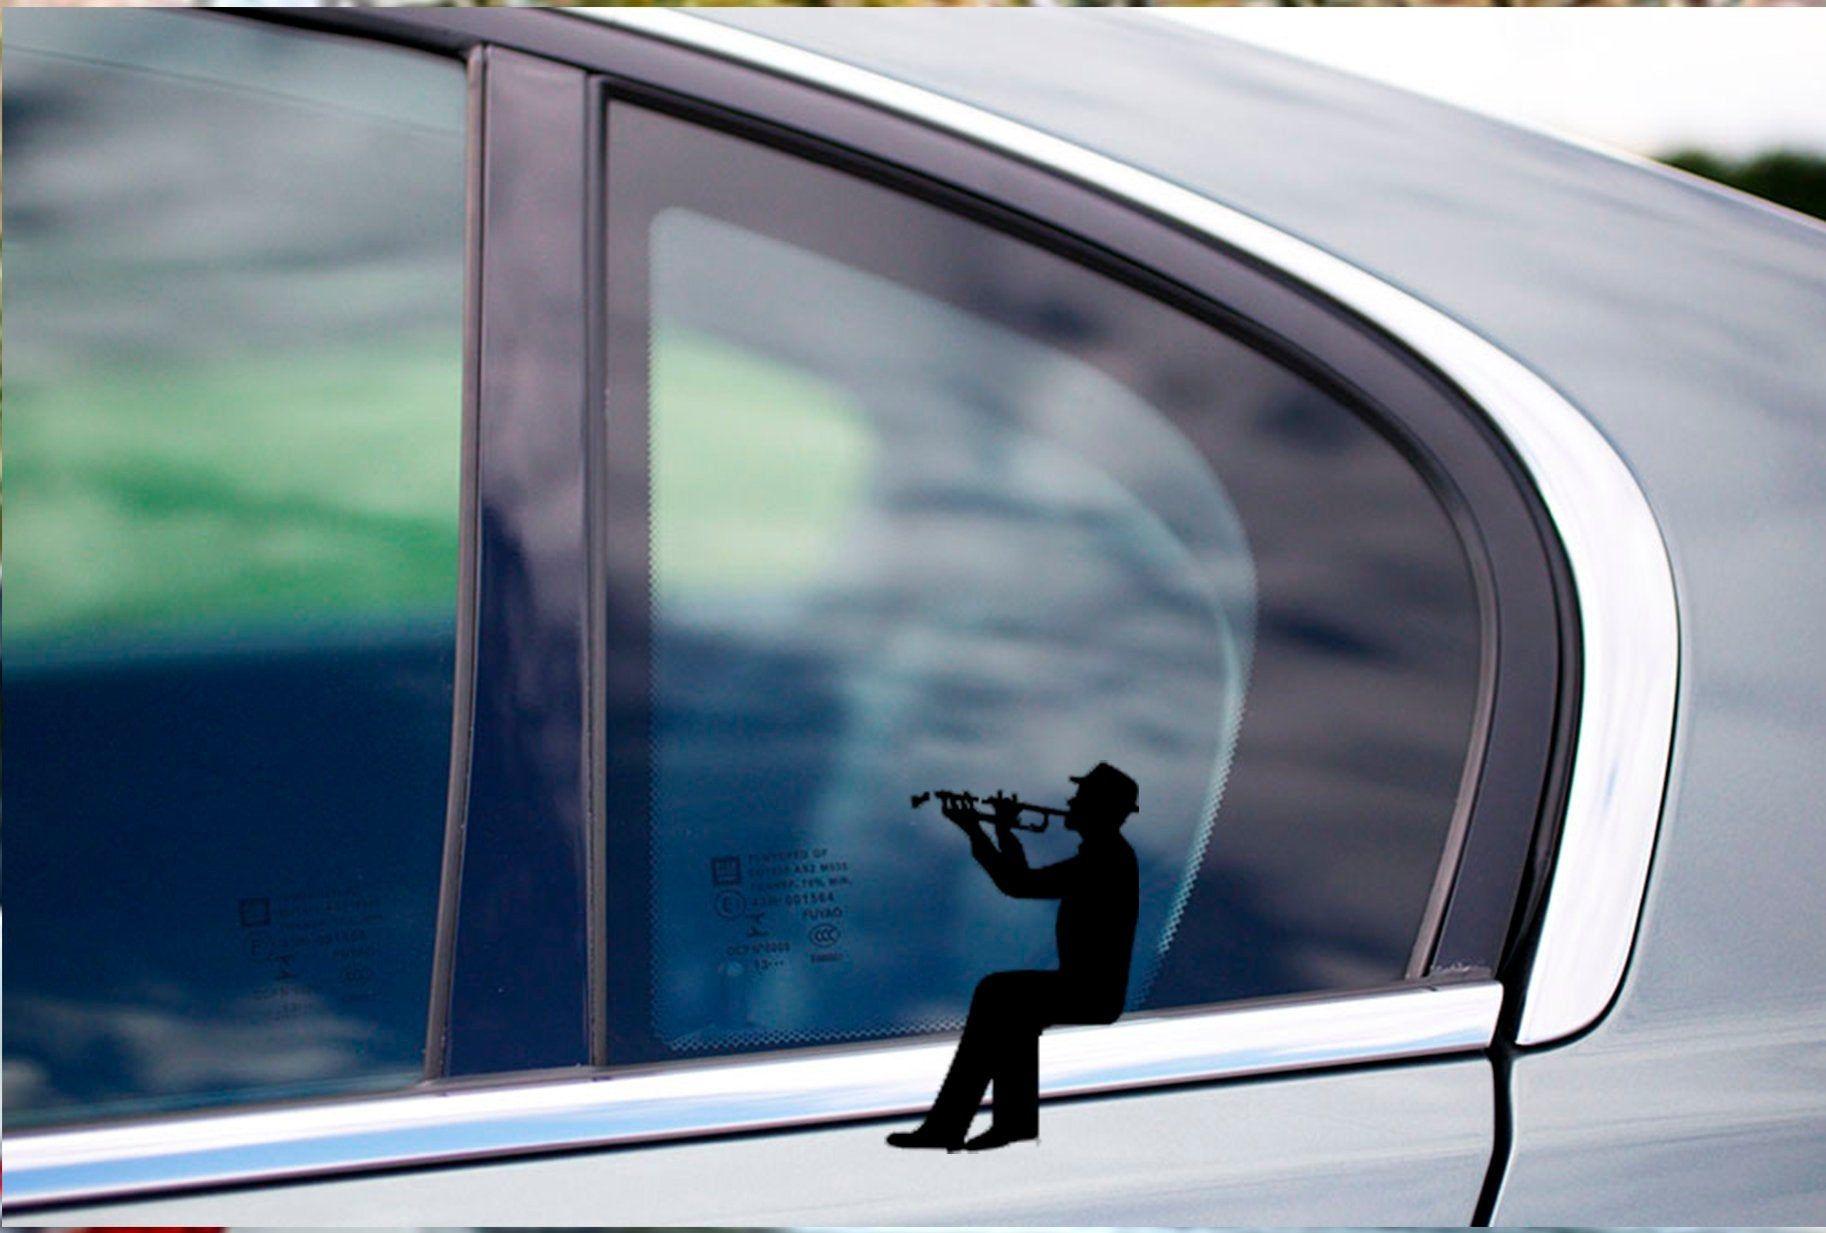 Trumpet Player Decal Light Switch Decal Sticker Car Window Decal Wall Sticker Labtop Decal Vinyl Art In Var Switch Decals Light Switch Decal Window Decals [ 1233 x 1826 Pixel ]